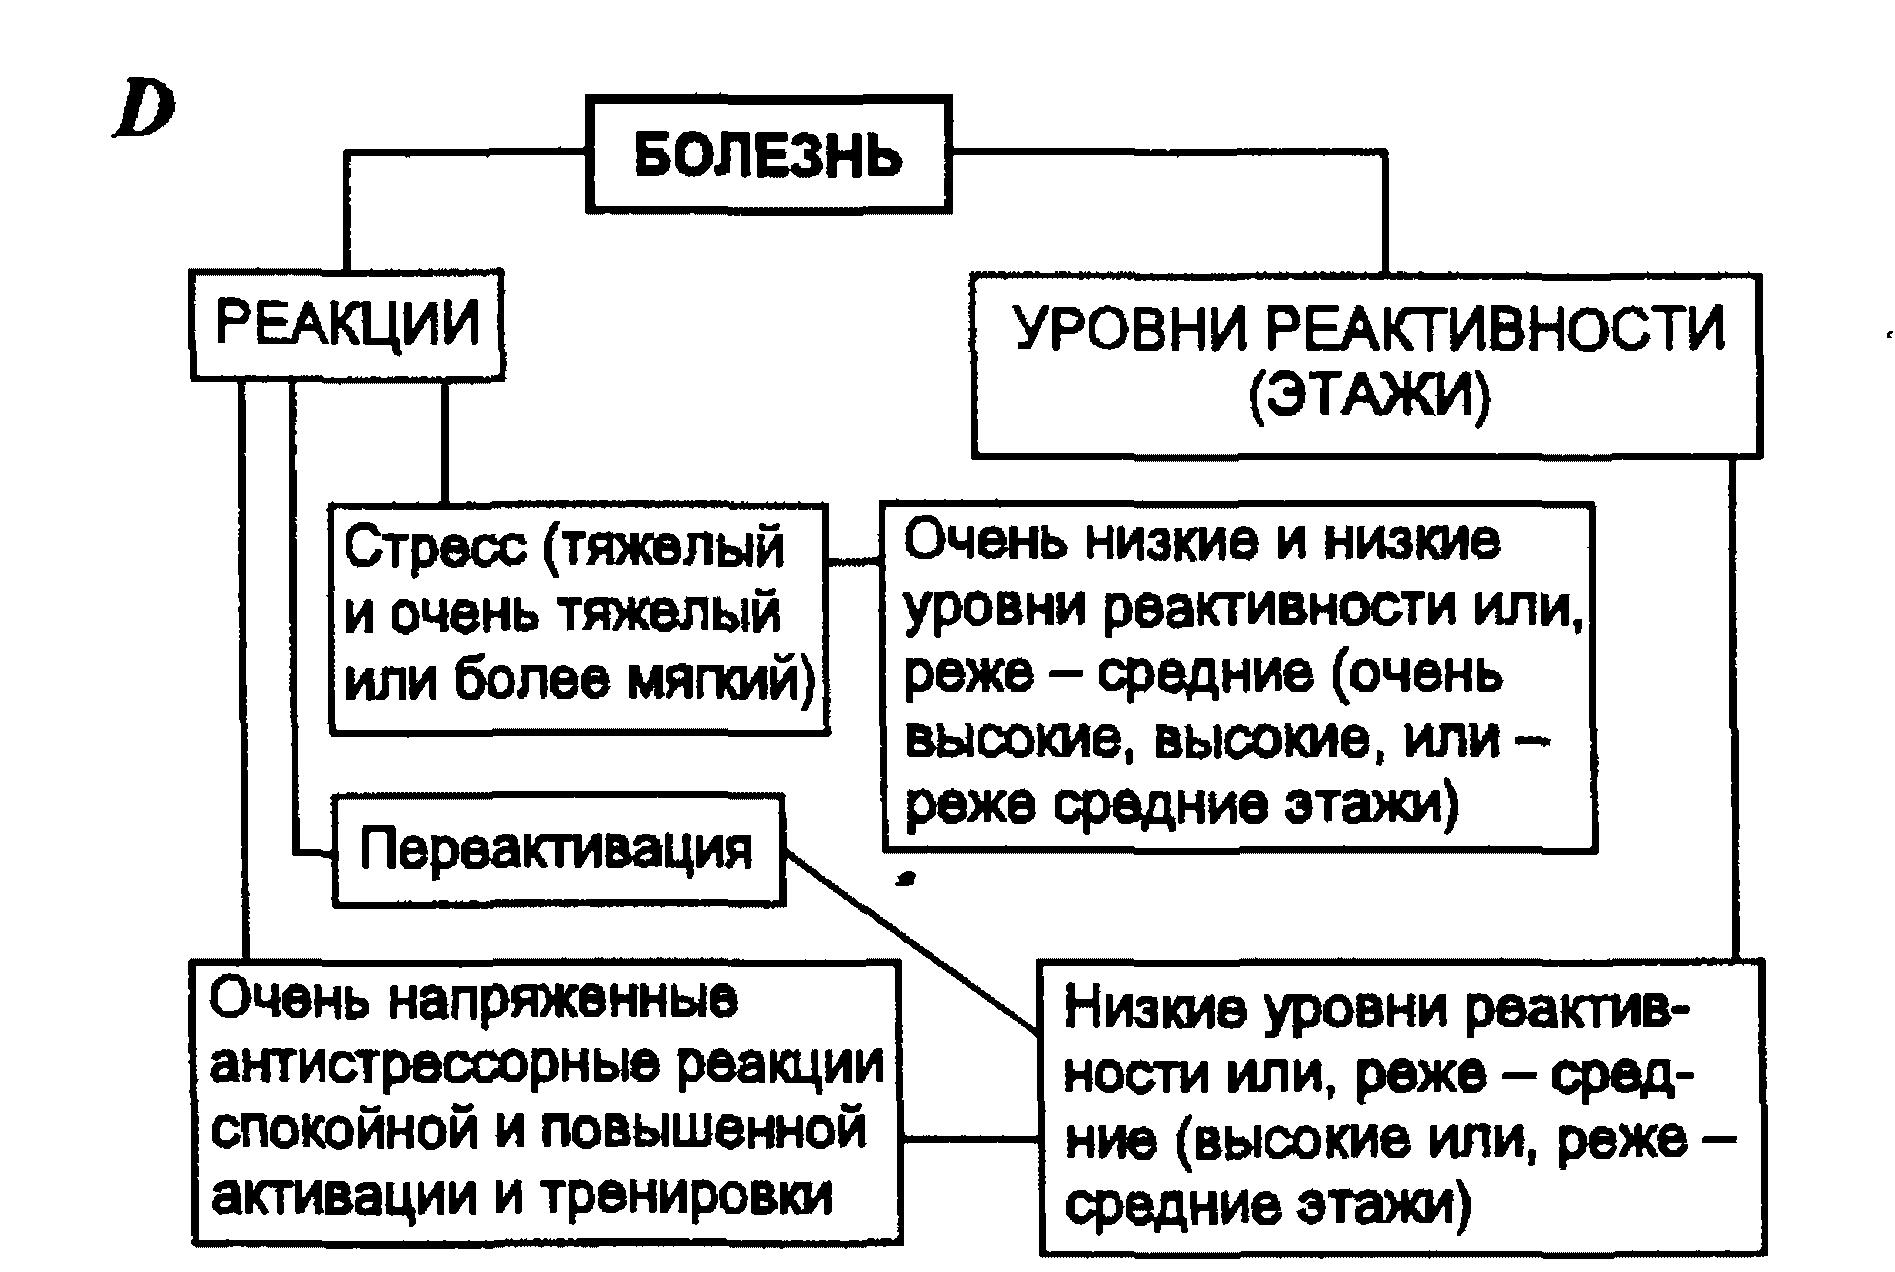 http://s4.uploads.ru/DVfnc.png